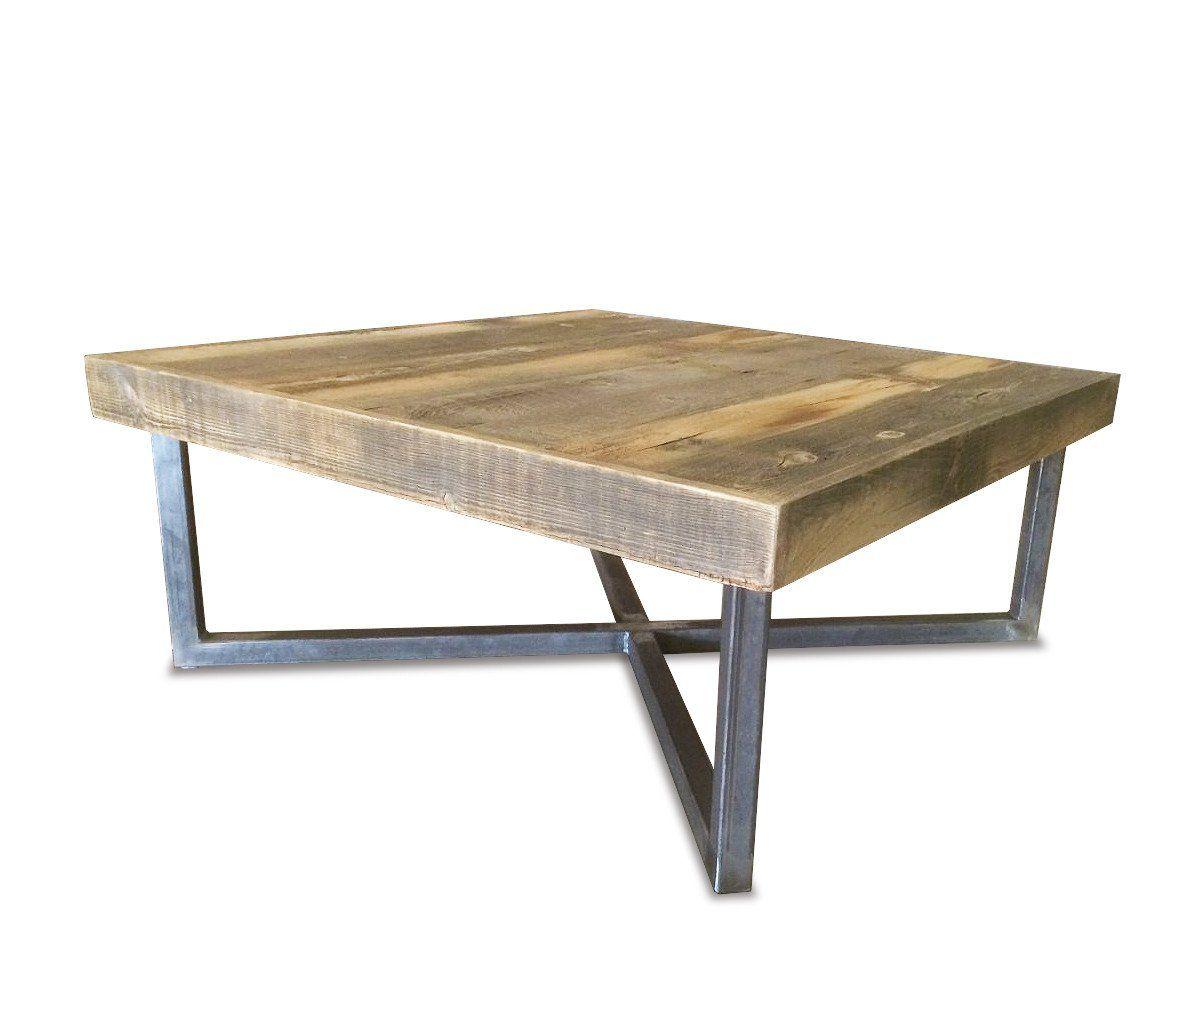 Reclaimed Wood Coffee Table Tube Steel Legs Free Shipping Jw